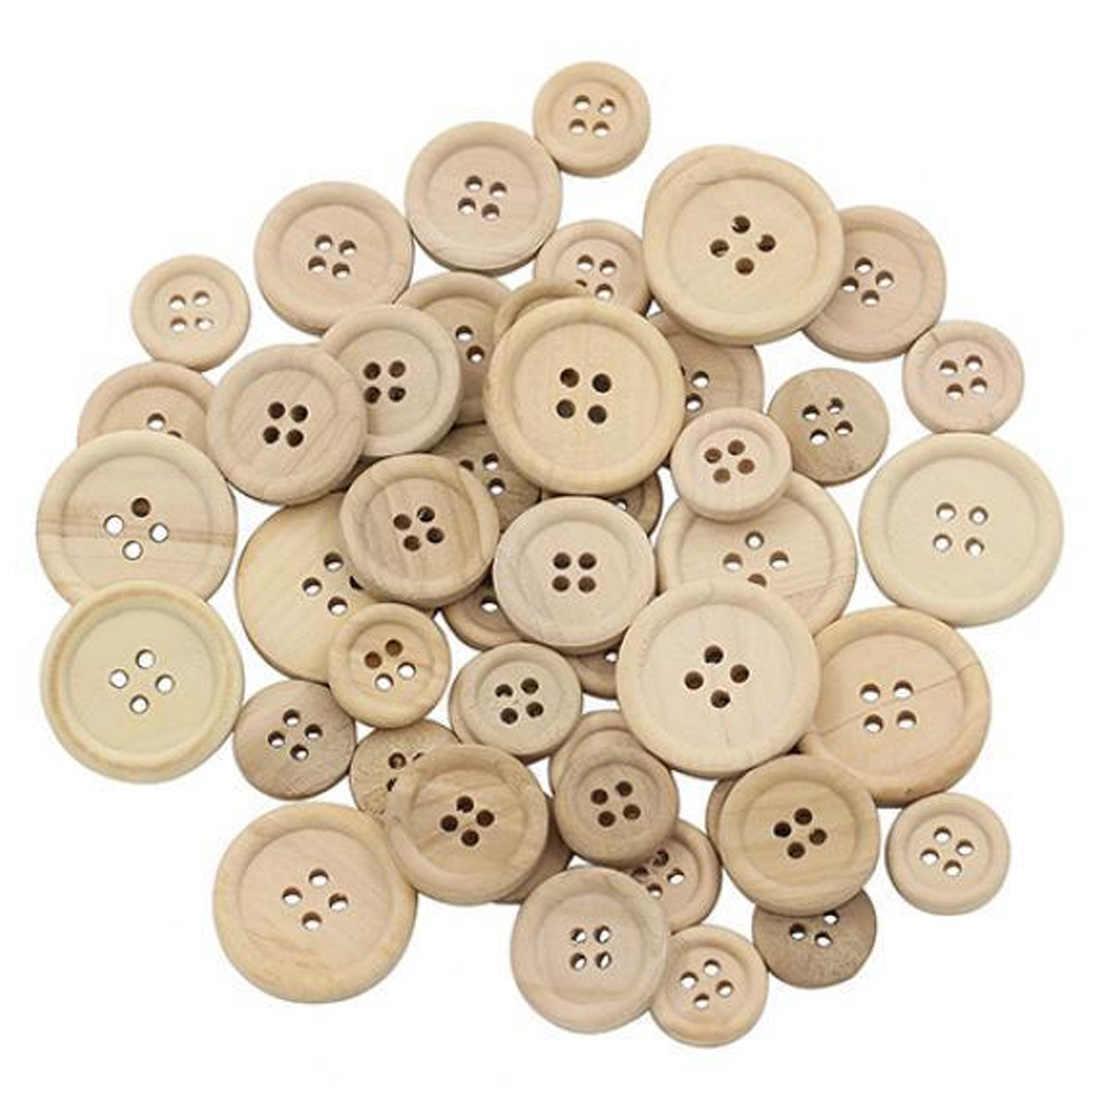 Botones de madera de 4 agujeros chatarra reserva botones álbum para ropa café Luz Color Natural coser botones